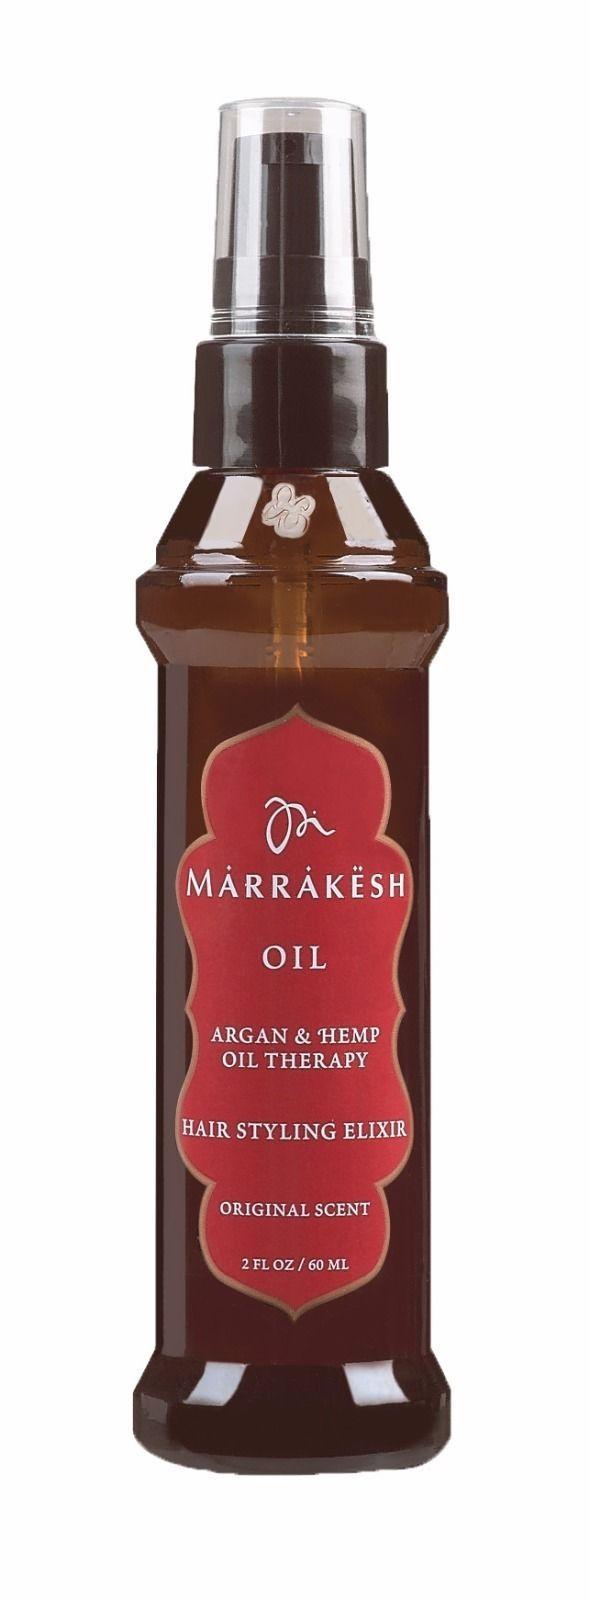 Marrakesh Oil Argan & Hemp Oil Therapy Hair Styling Elixir Original Scent 2oz